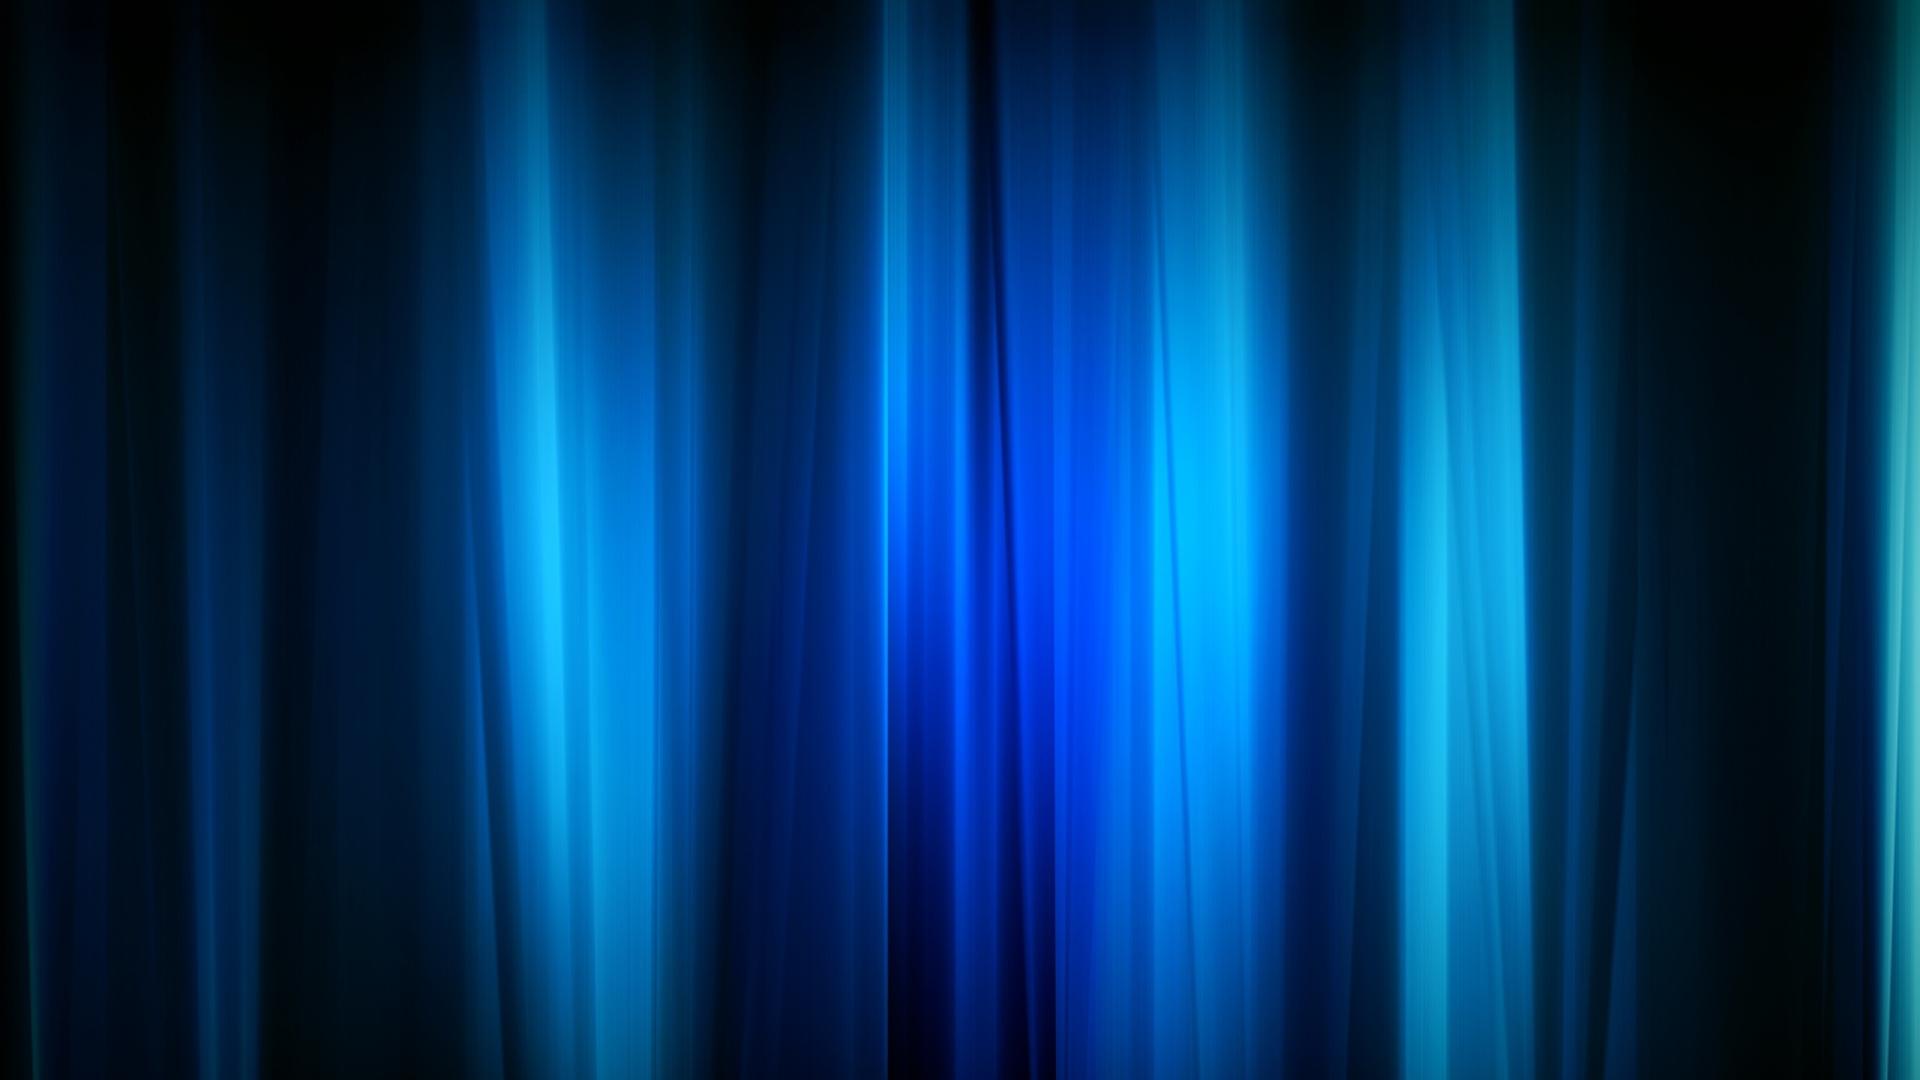 Blue Color HD Wallpaper   Wallpaper High Definition High Quality 1920x1080